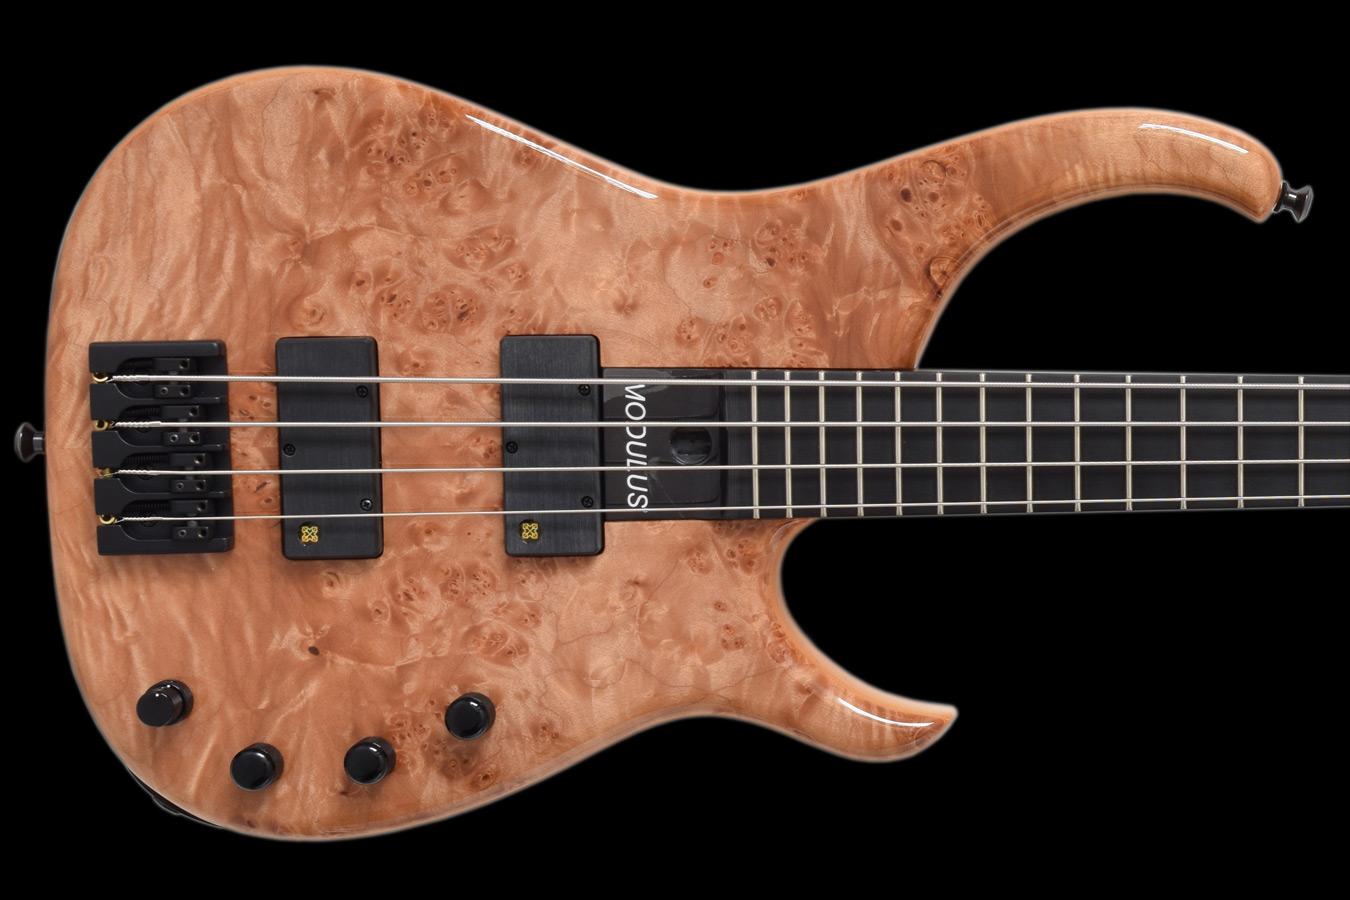 Modulus Bass Quantum 4 Burl Maple High End Bass Guitars